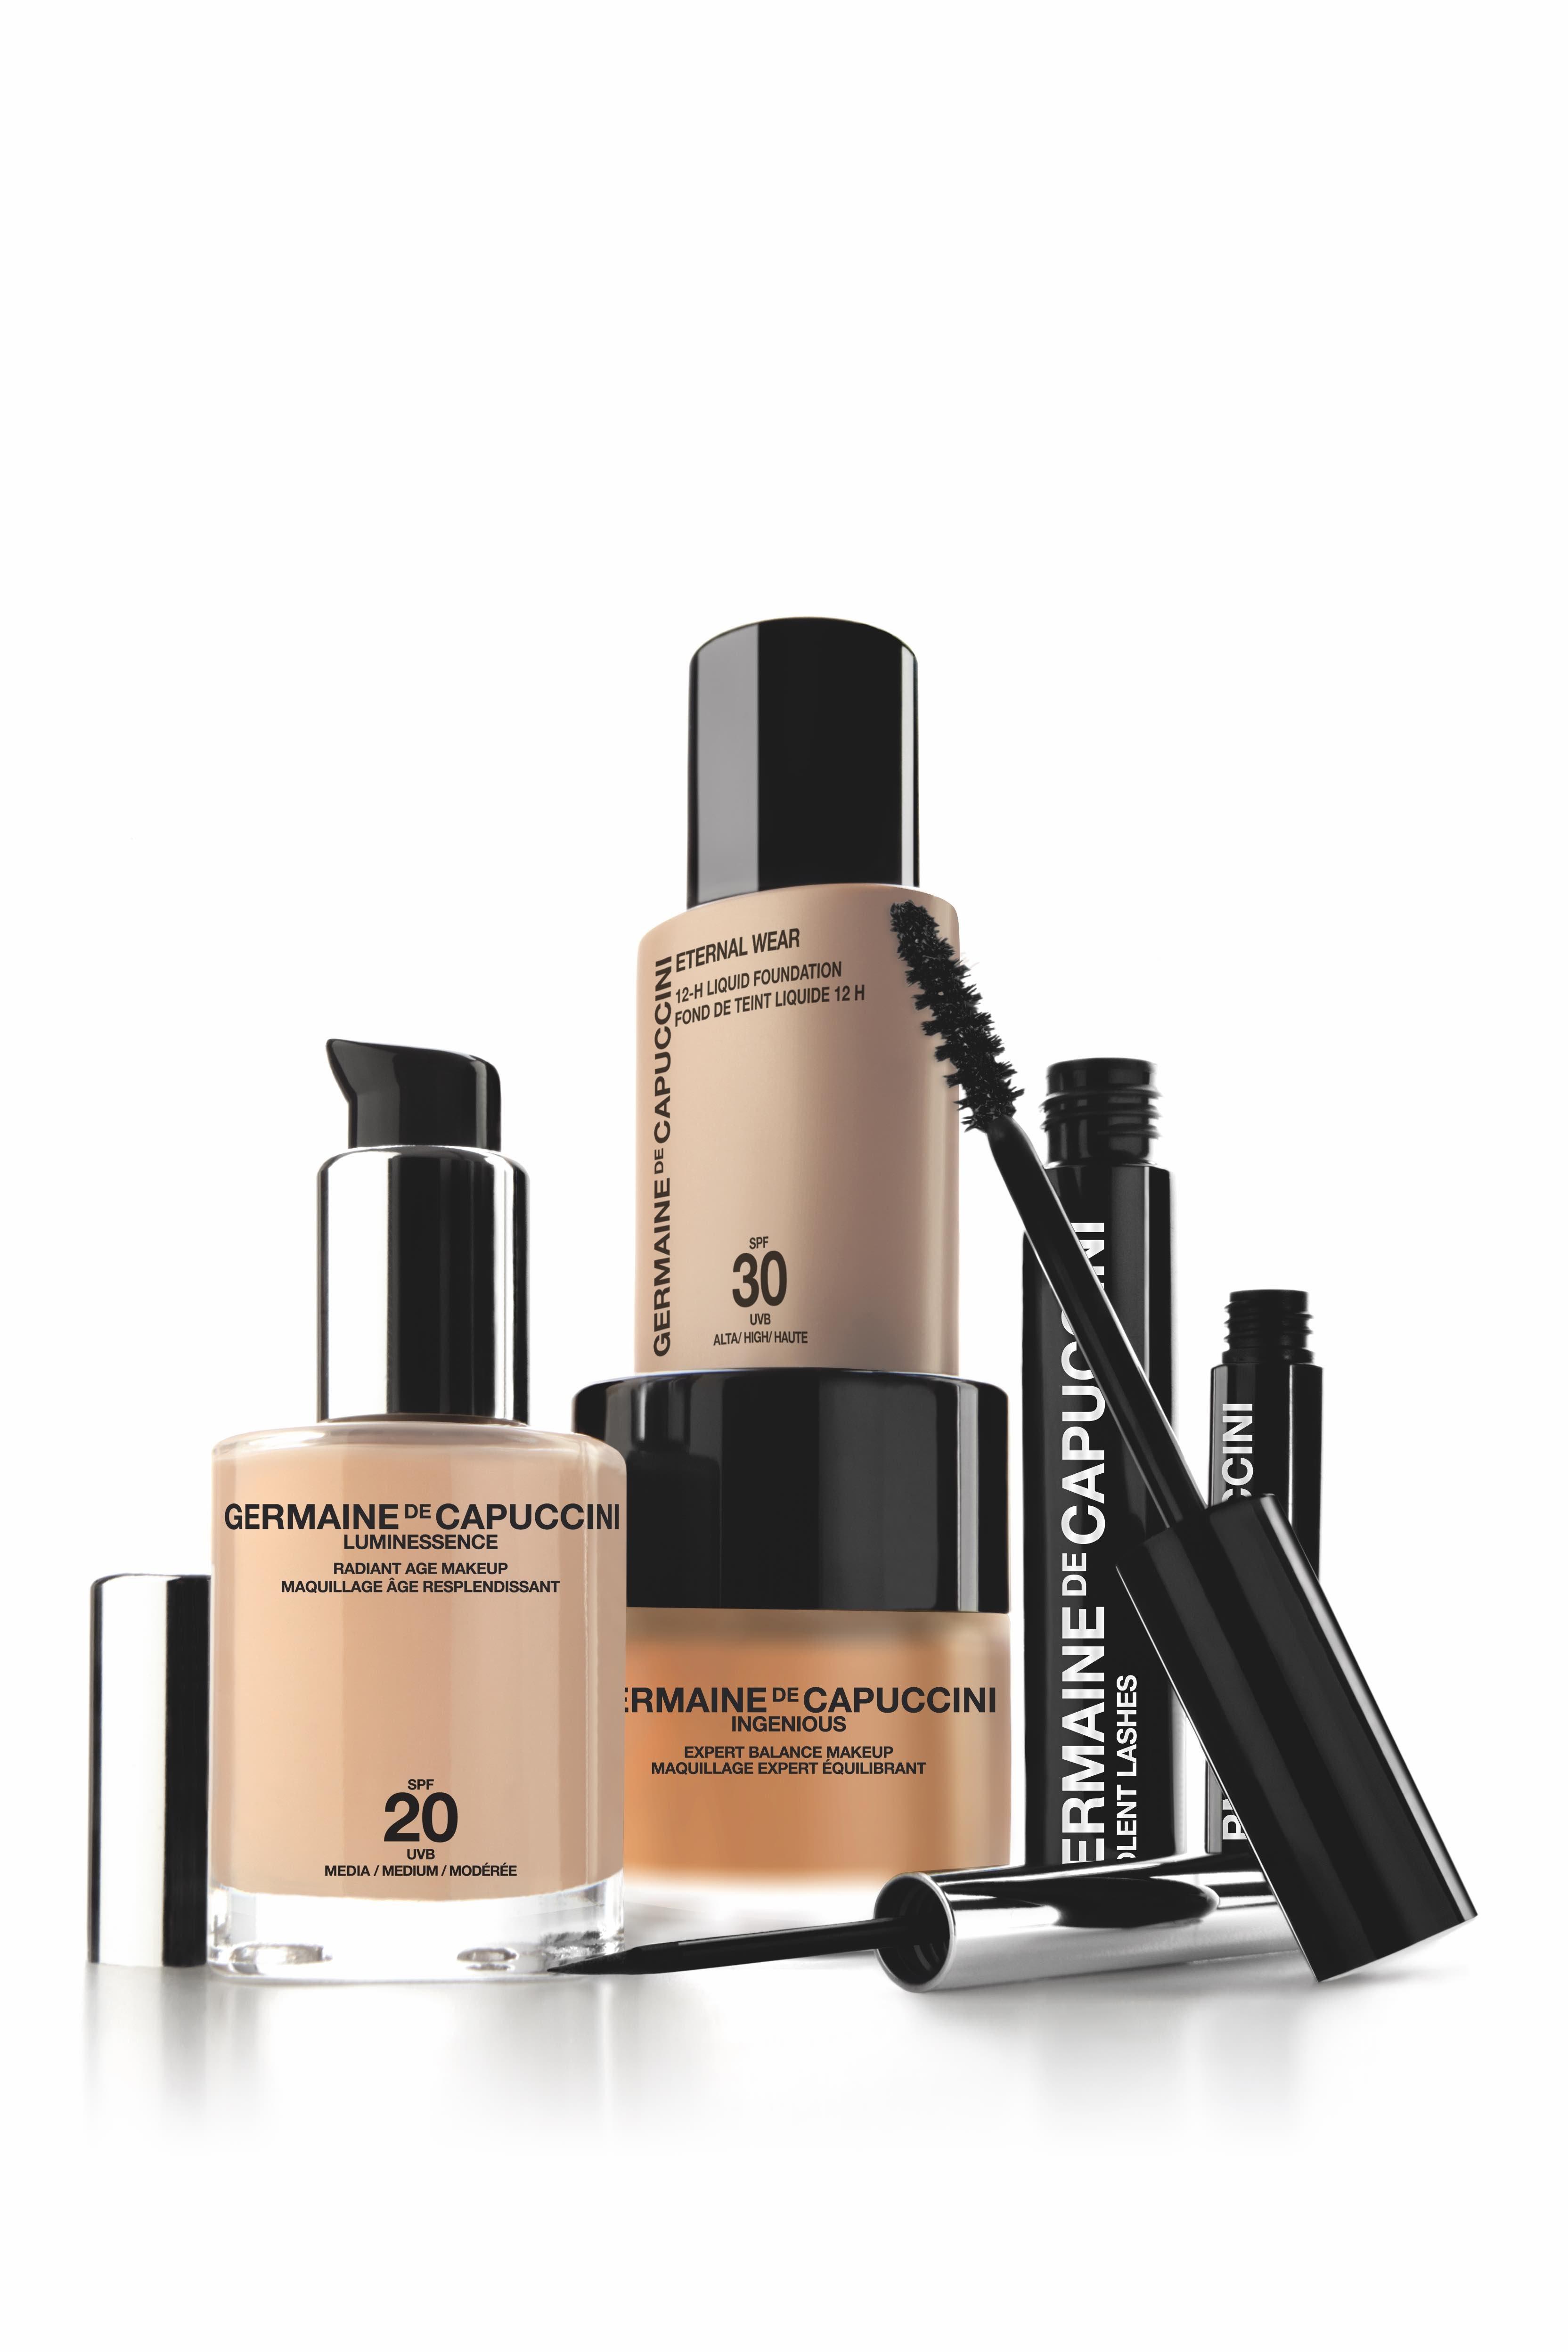 Make up - Πλήρης σειρά μακιγιάζ